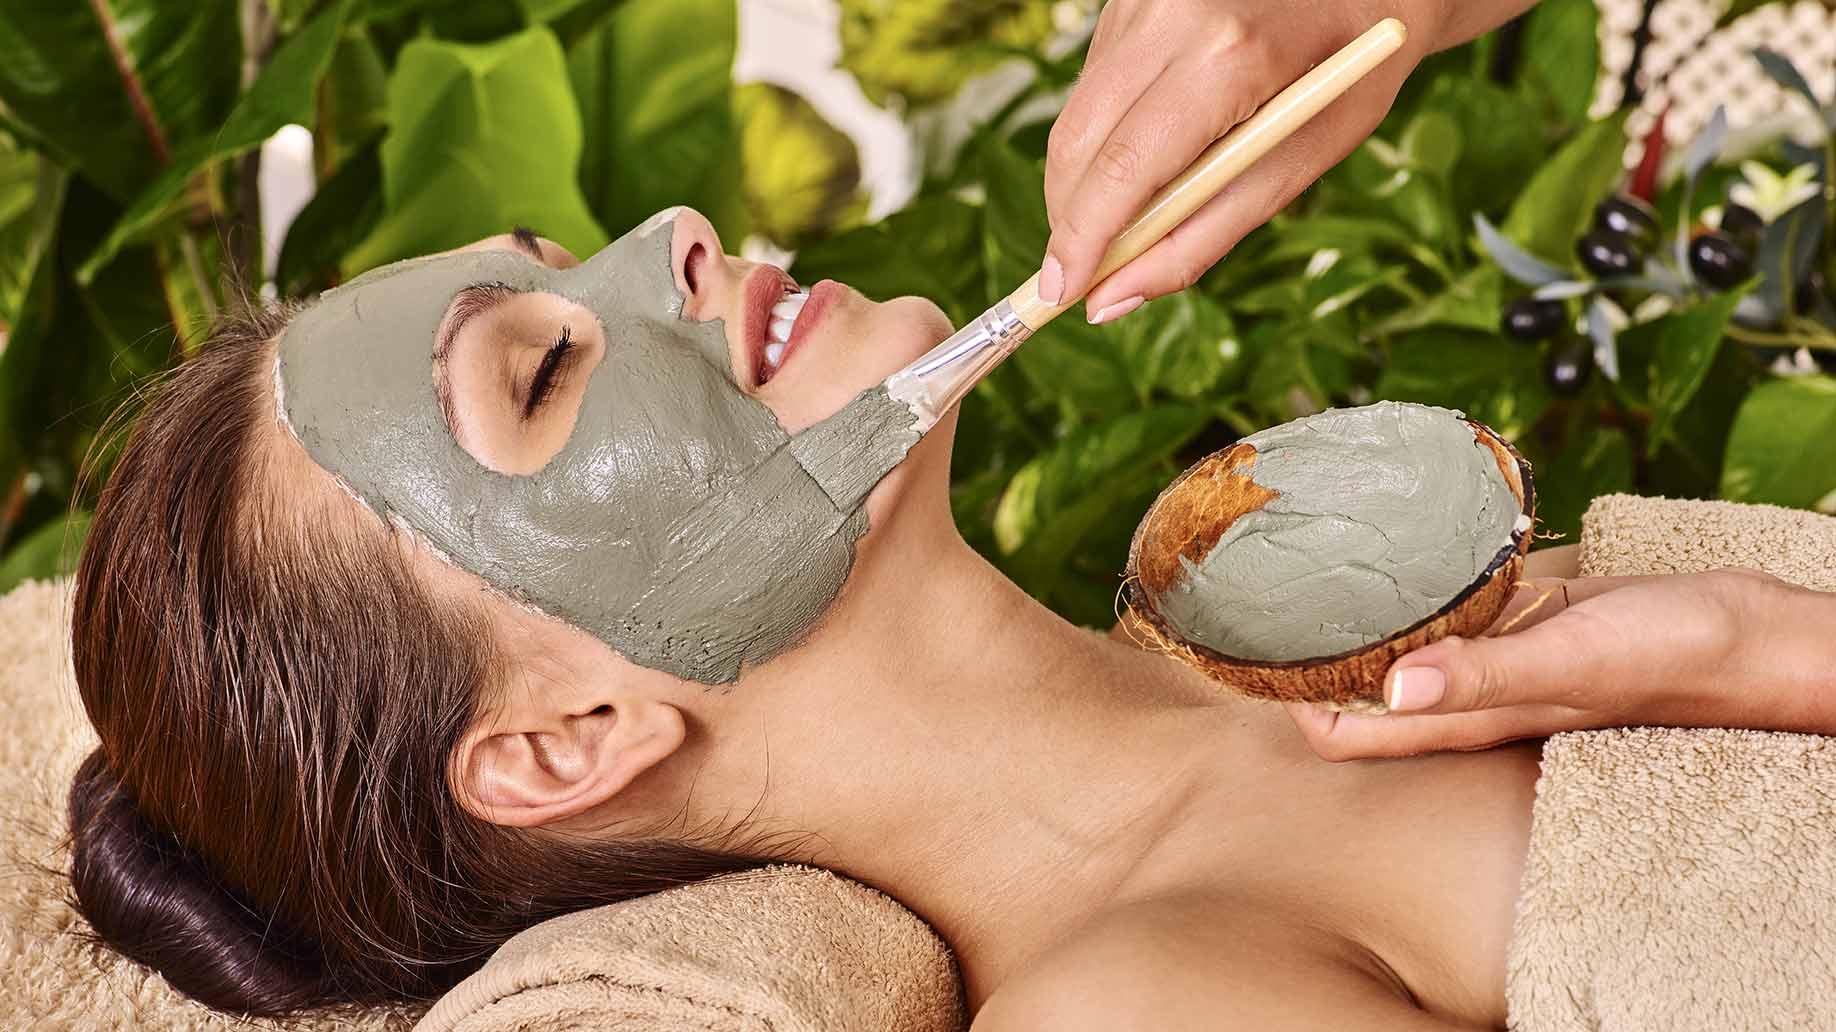 Health good reasons to start using facial masks using facial masks provides a deep cleansing solutioingenieria Choice Image